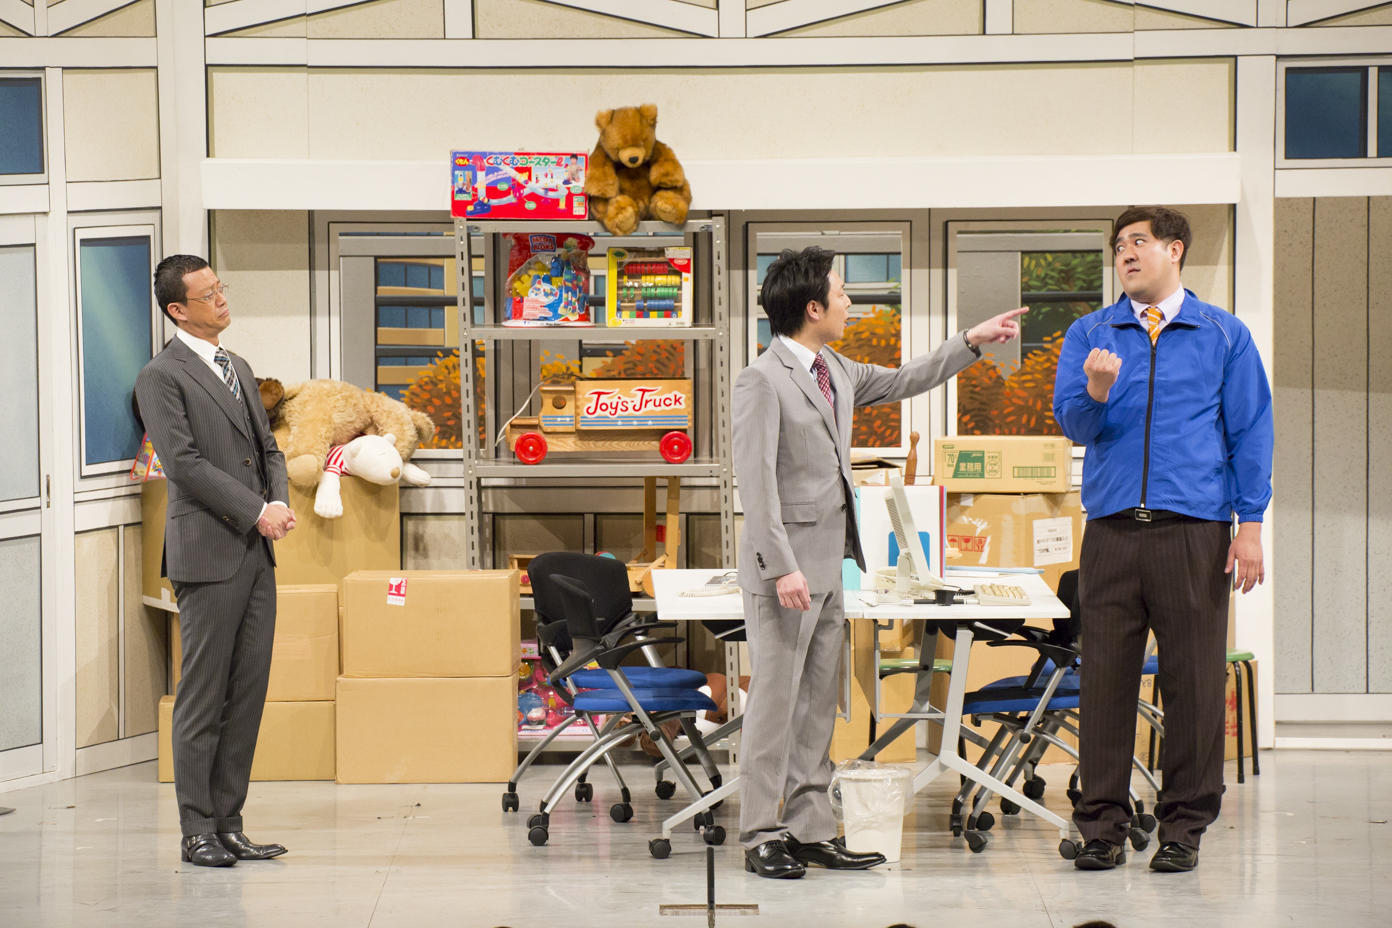 http://news.yoshimoto.co.jp/20161130160012-fab291f0e21c212f3fc55494b38ea29346726e8e.jpg